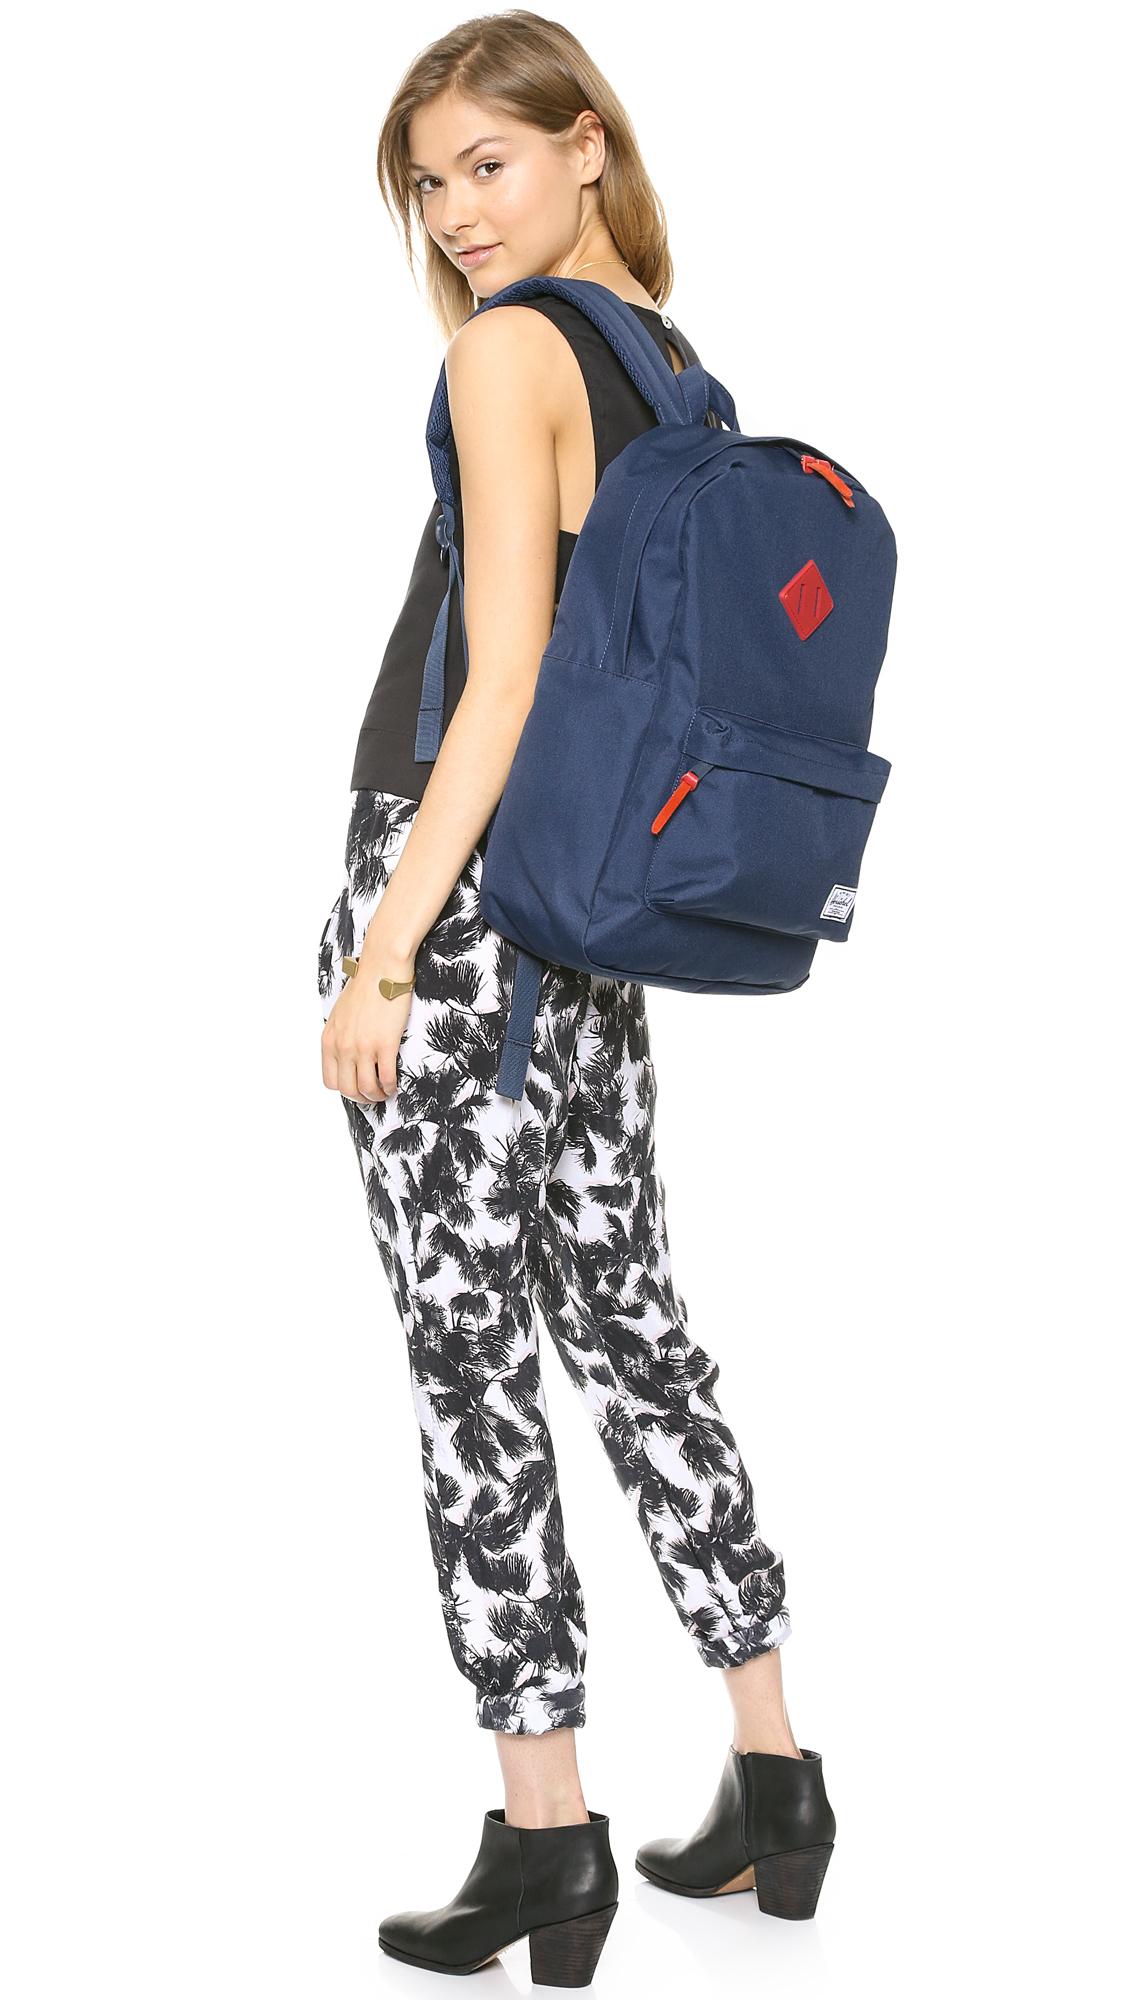 52be26894eb9 Herschel Heritage Youth Backpack Chambray - Daftar Harga Terbaru ...